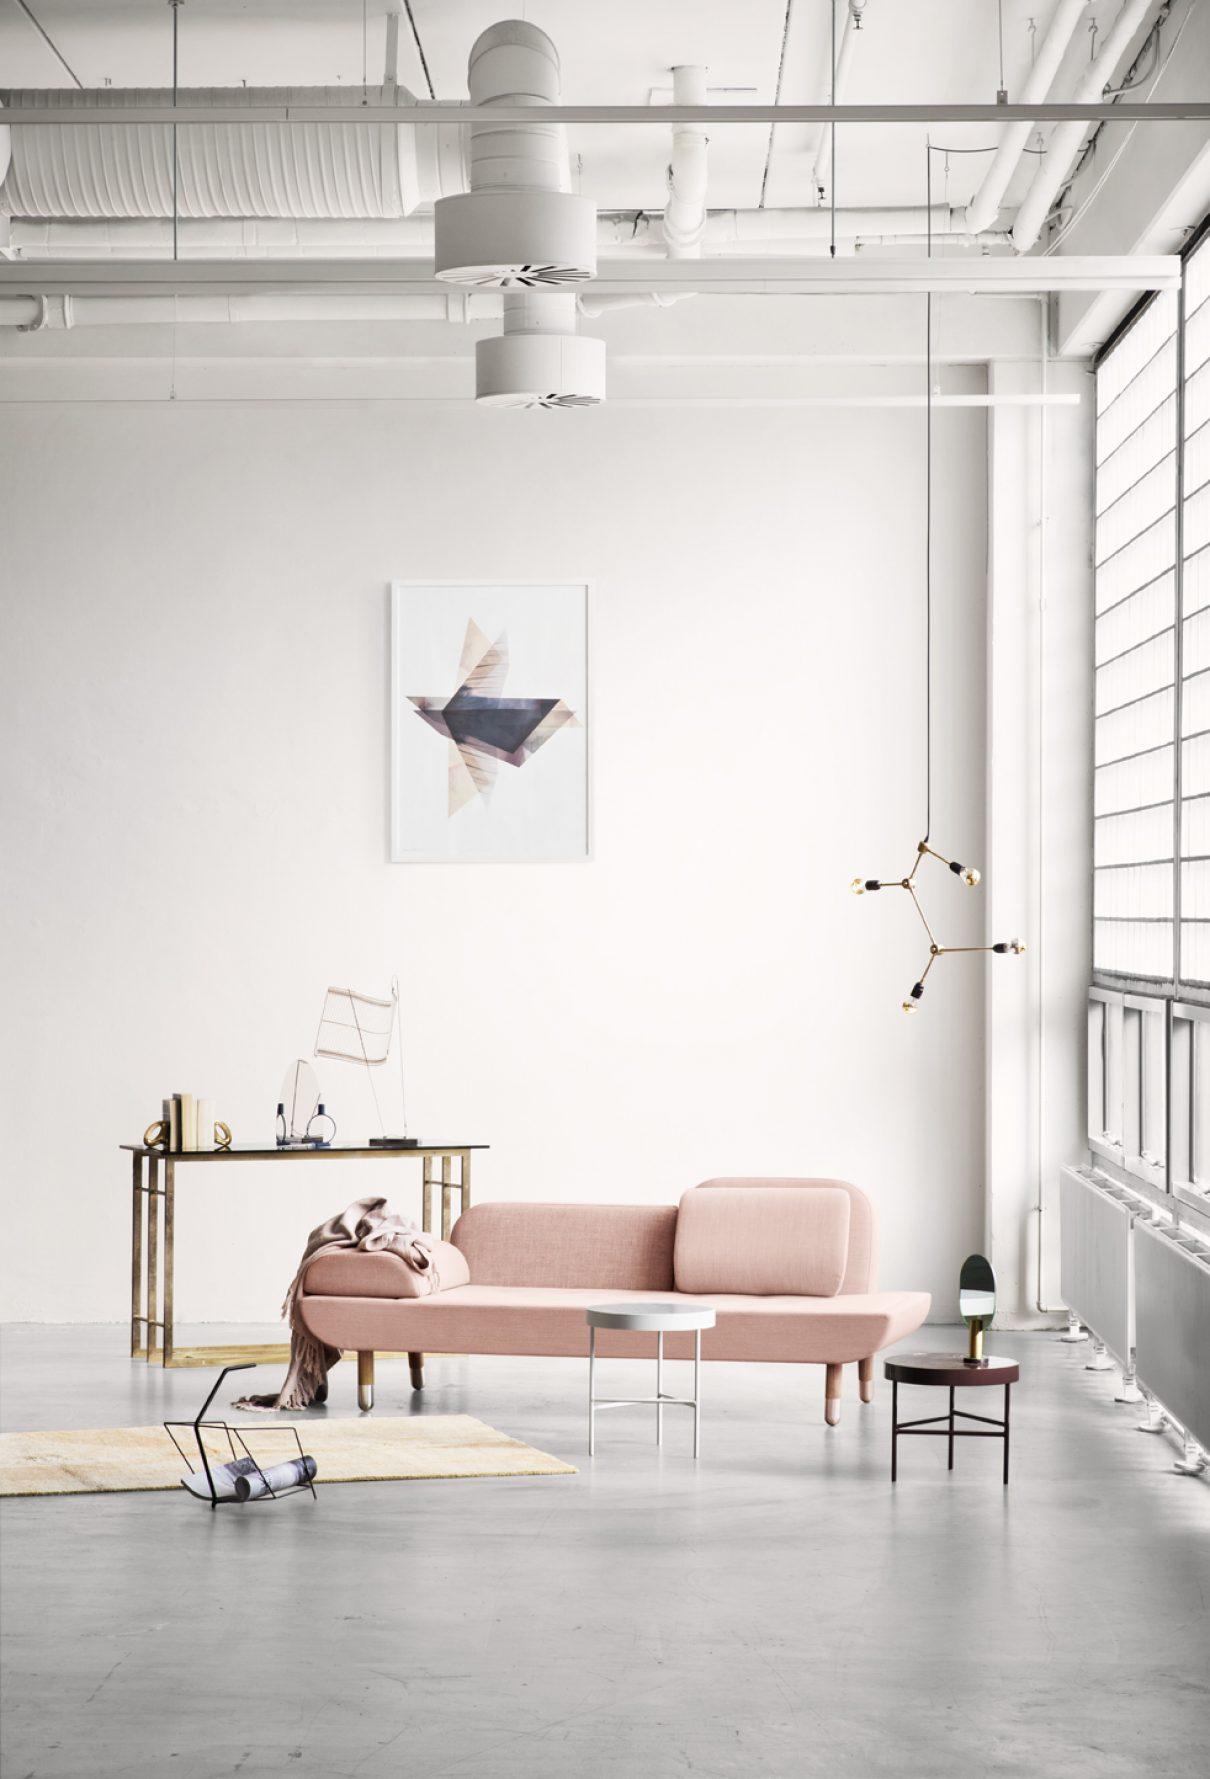 Interieurs met kalmerende schoonheid